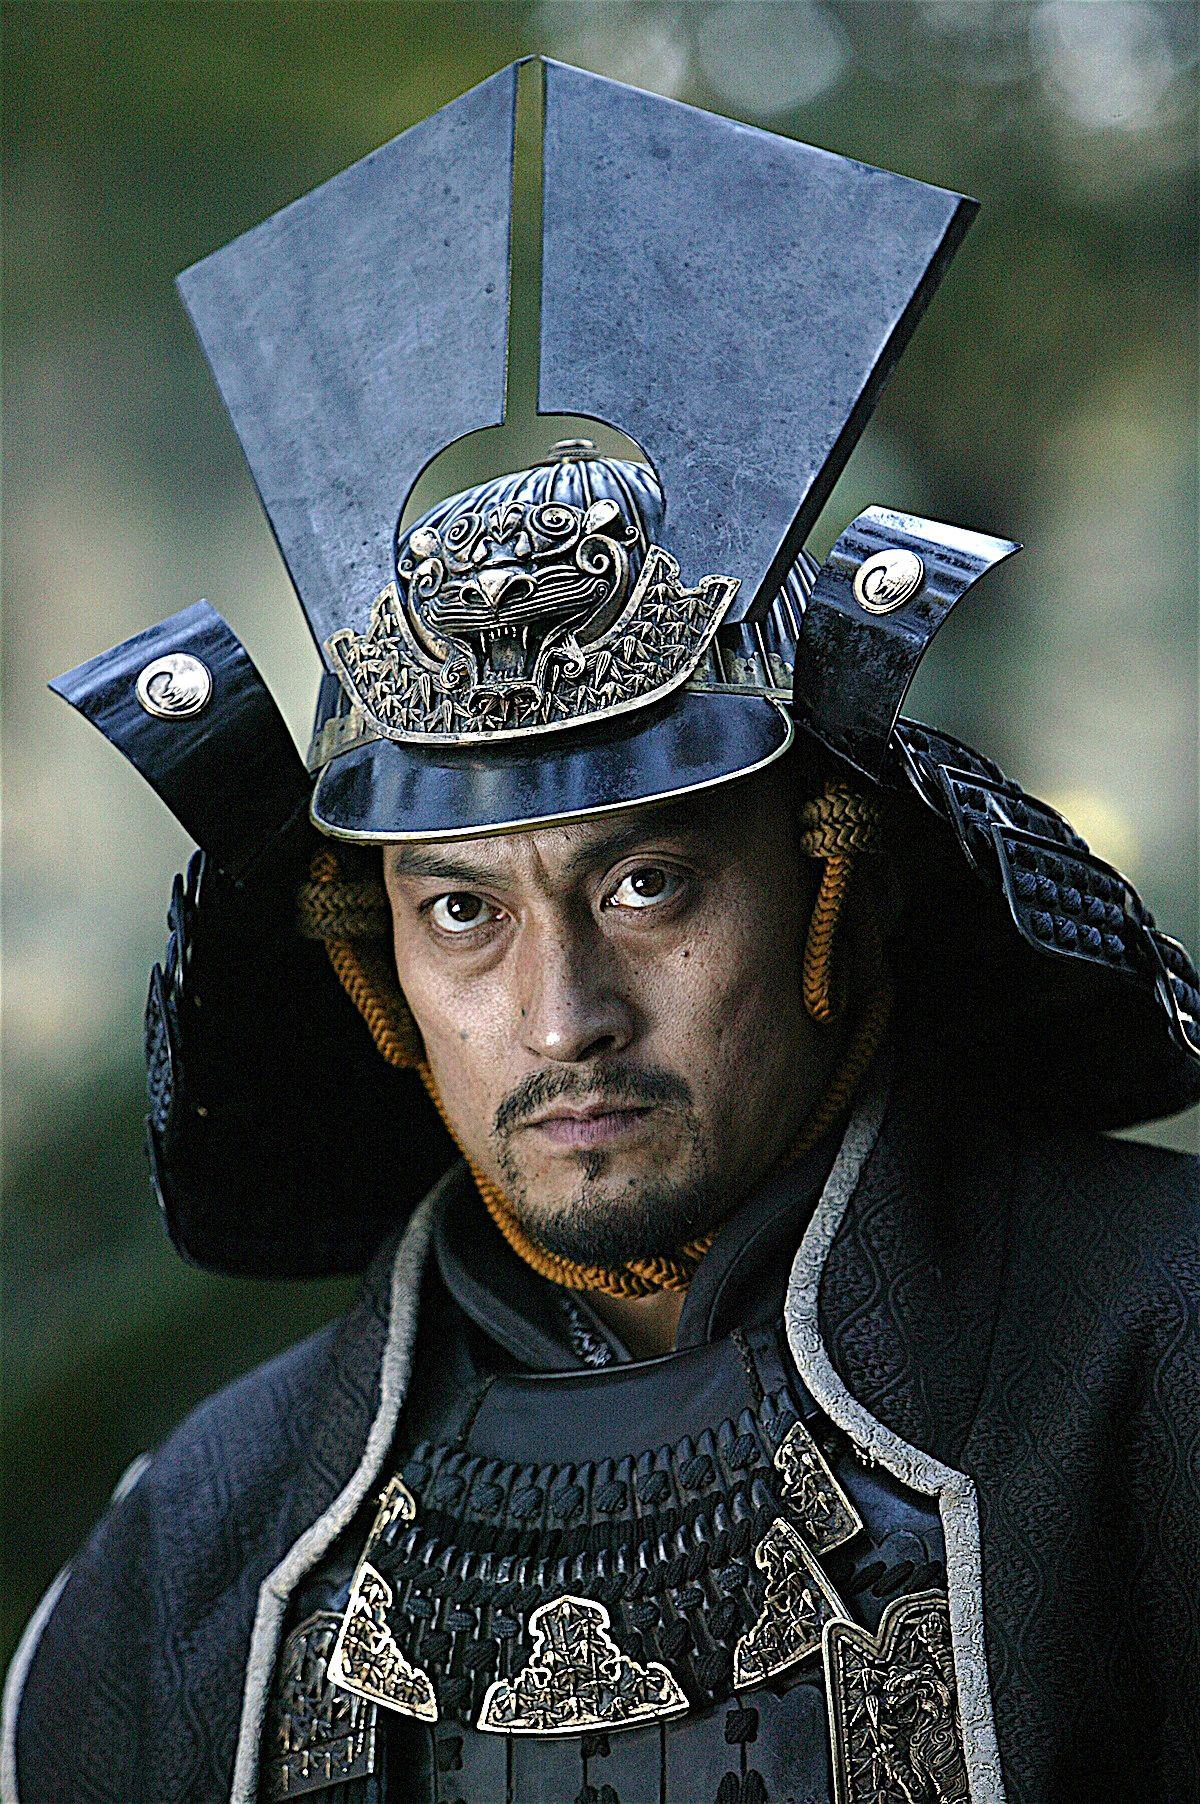 Last Samurai 2003 Ken Watanabe as Katsumoto (With images